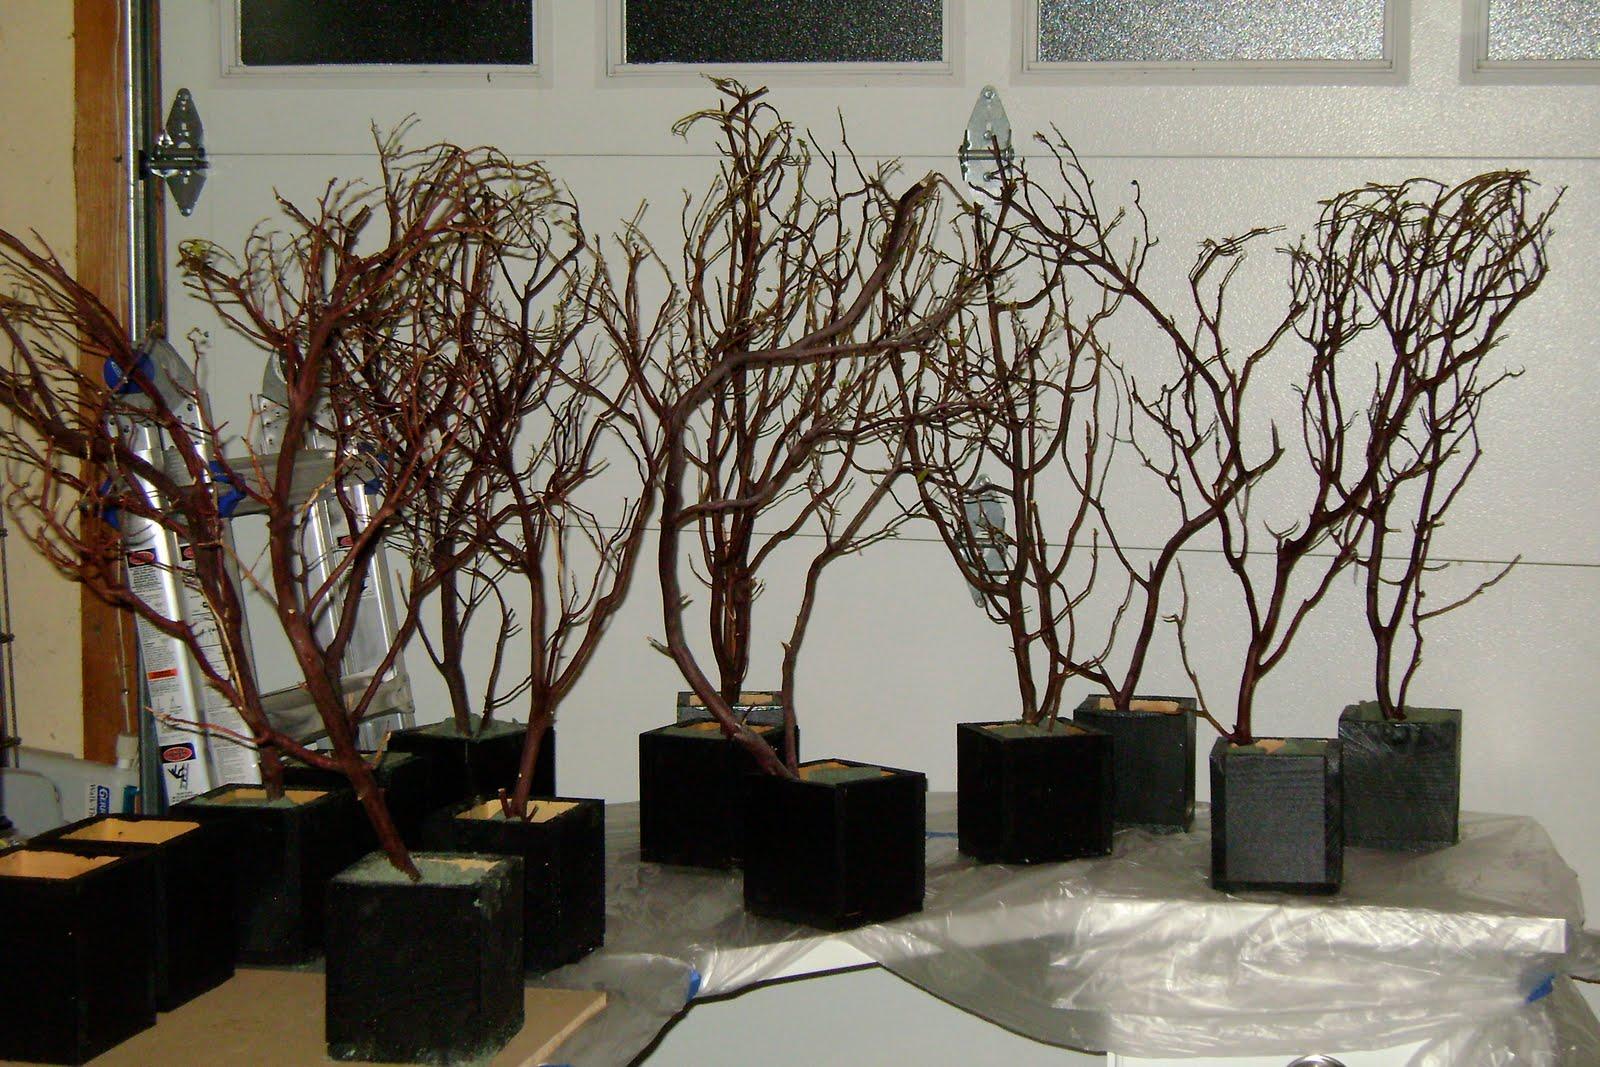 design aholic manzanita branch centerpiece decor. Black Bedroom Furniture Sets. Home Design Ideas